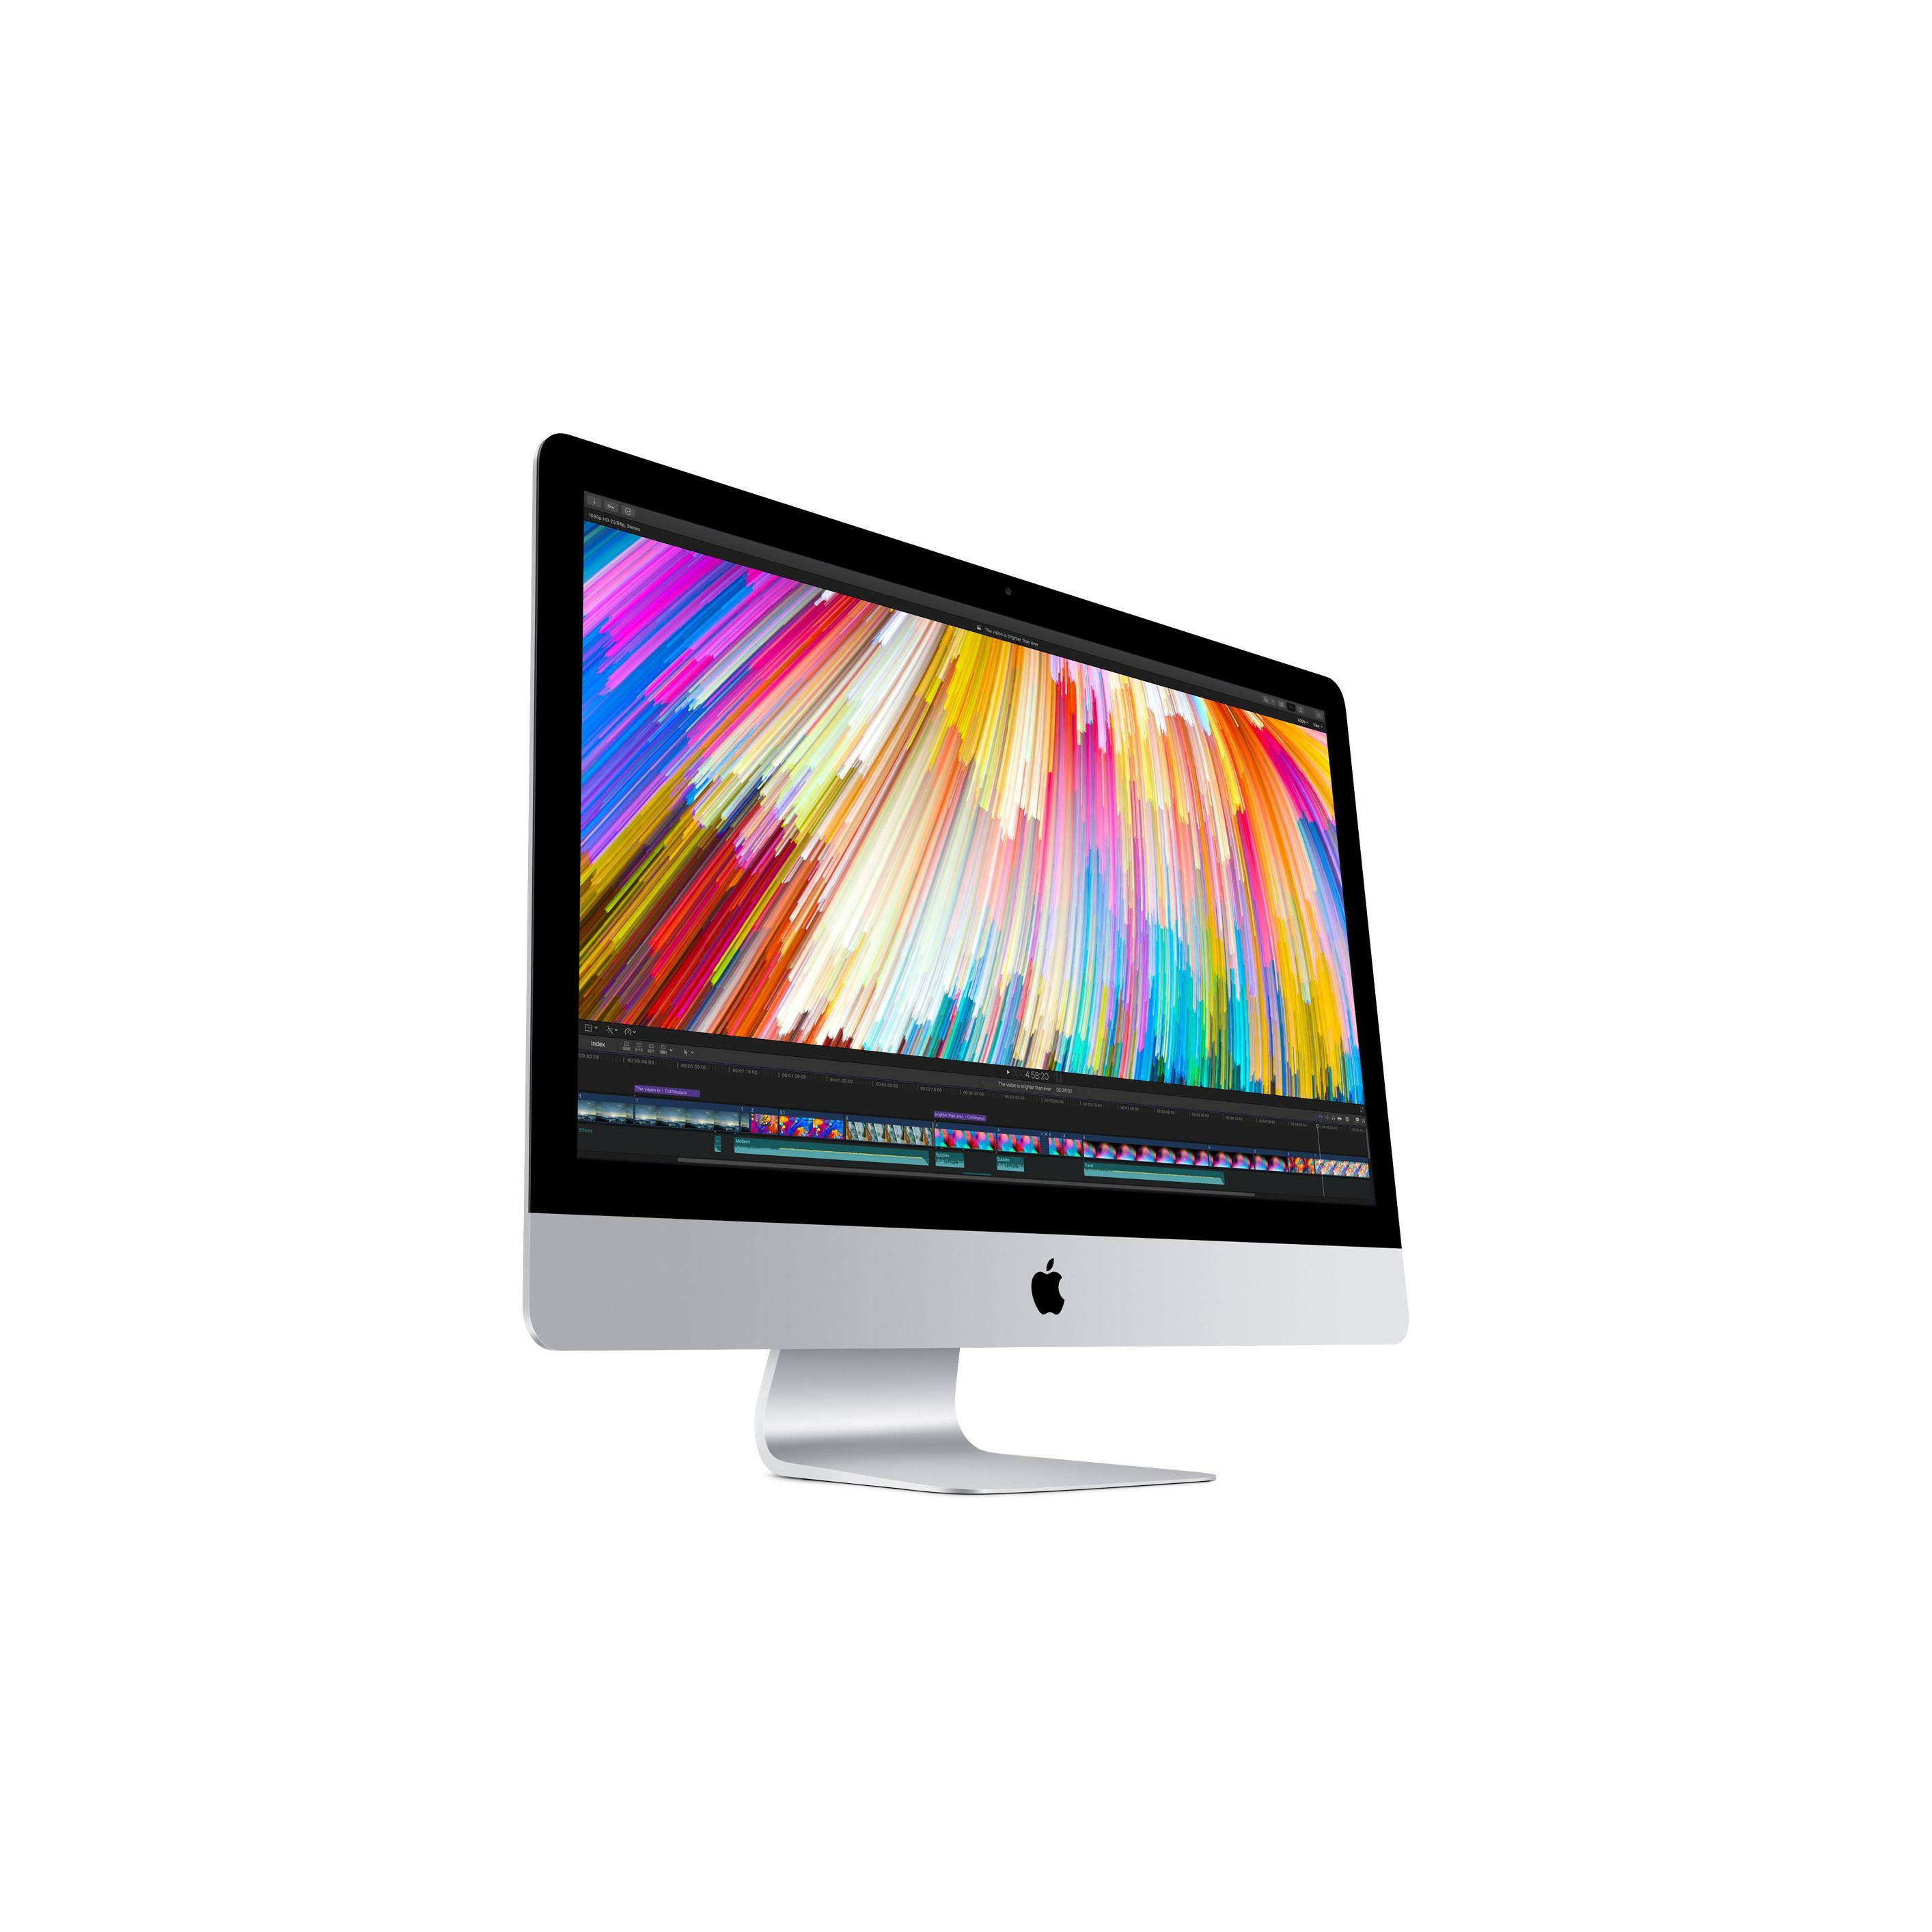 "iMac 27"" 5K (Late 2015) Core i5 3,3 GHz - SSD 128 GB + HDD 2 TB - 16GB AZERTY - Ranska"